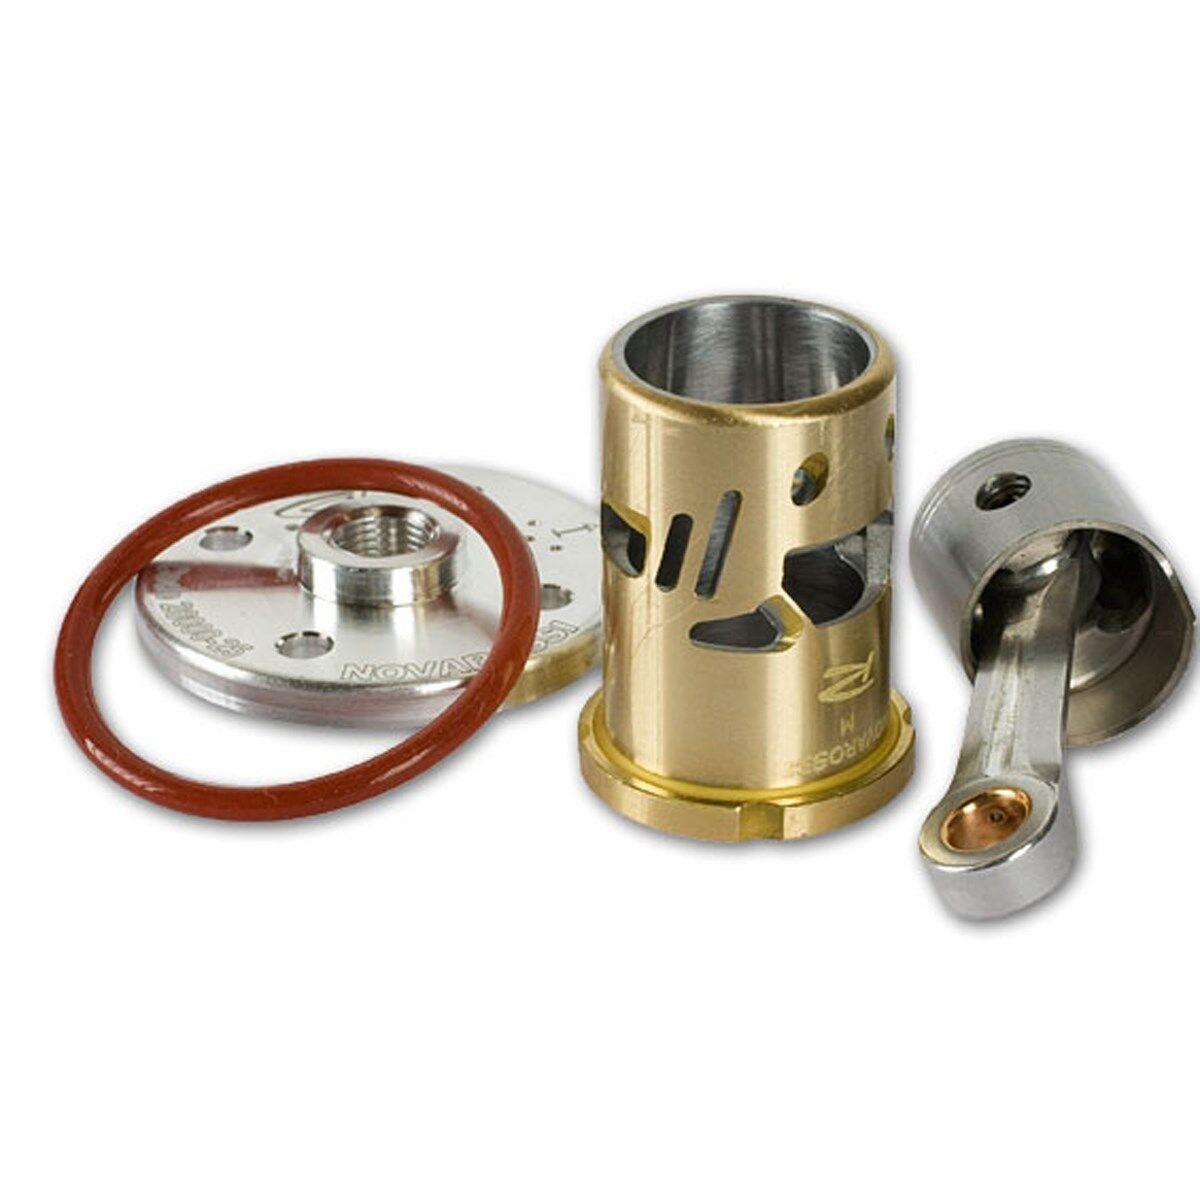 Novarossi Complete Coupling 3.5cc 9P Long Stroke  MITO 35 - NVR08500 16